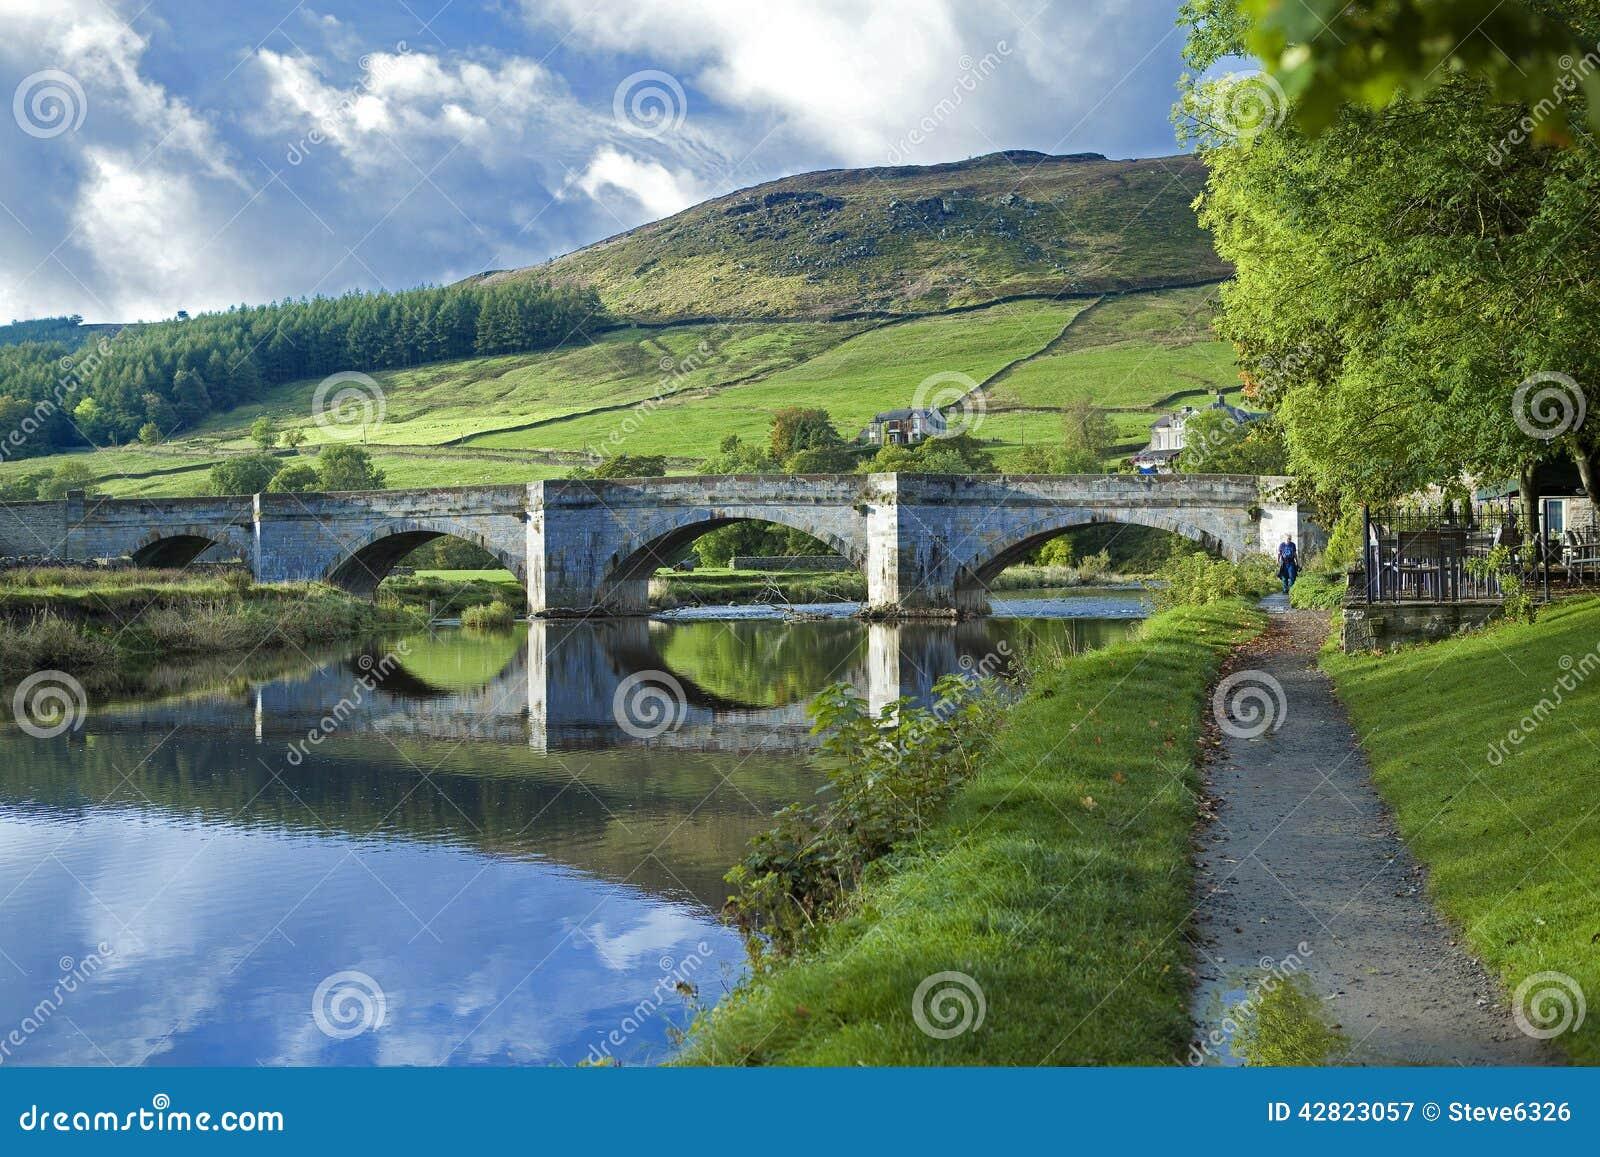 Burnsall y el río Wharfe